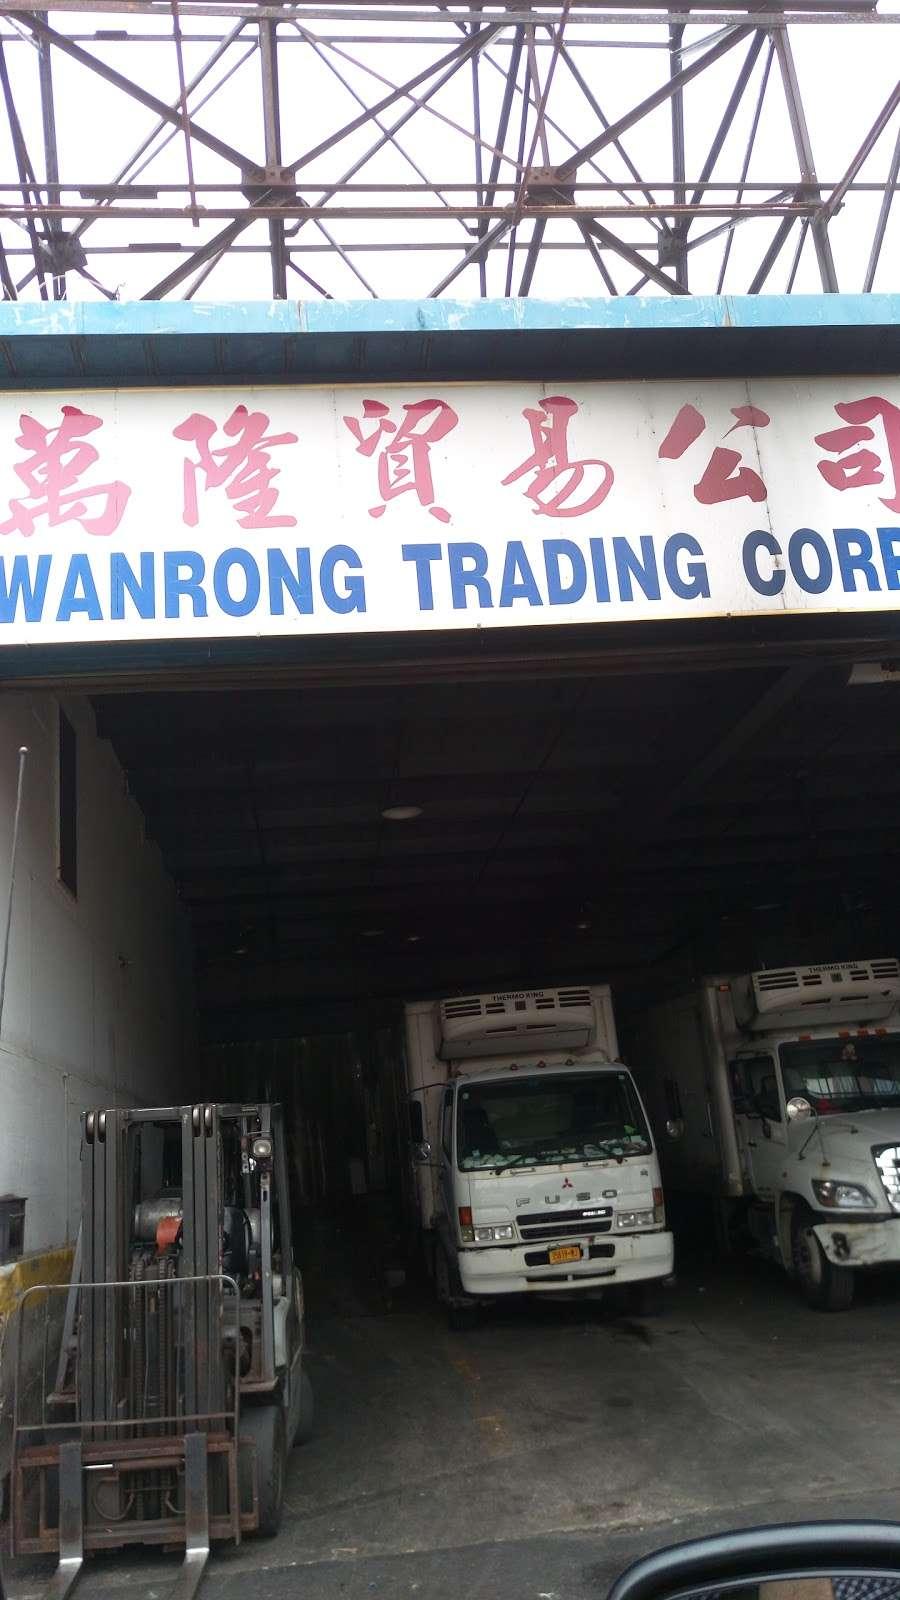 Wanrong Trading Truck Docks - storage  | Photo 9 of 10 | Address: 32-27-, 32-45 Hunters Point Ave, Long Island City, NY 11101, USA | Phone: (718) 361-8882